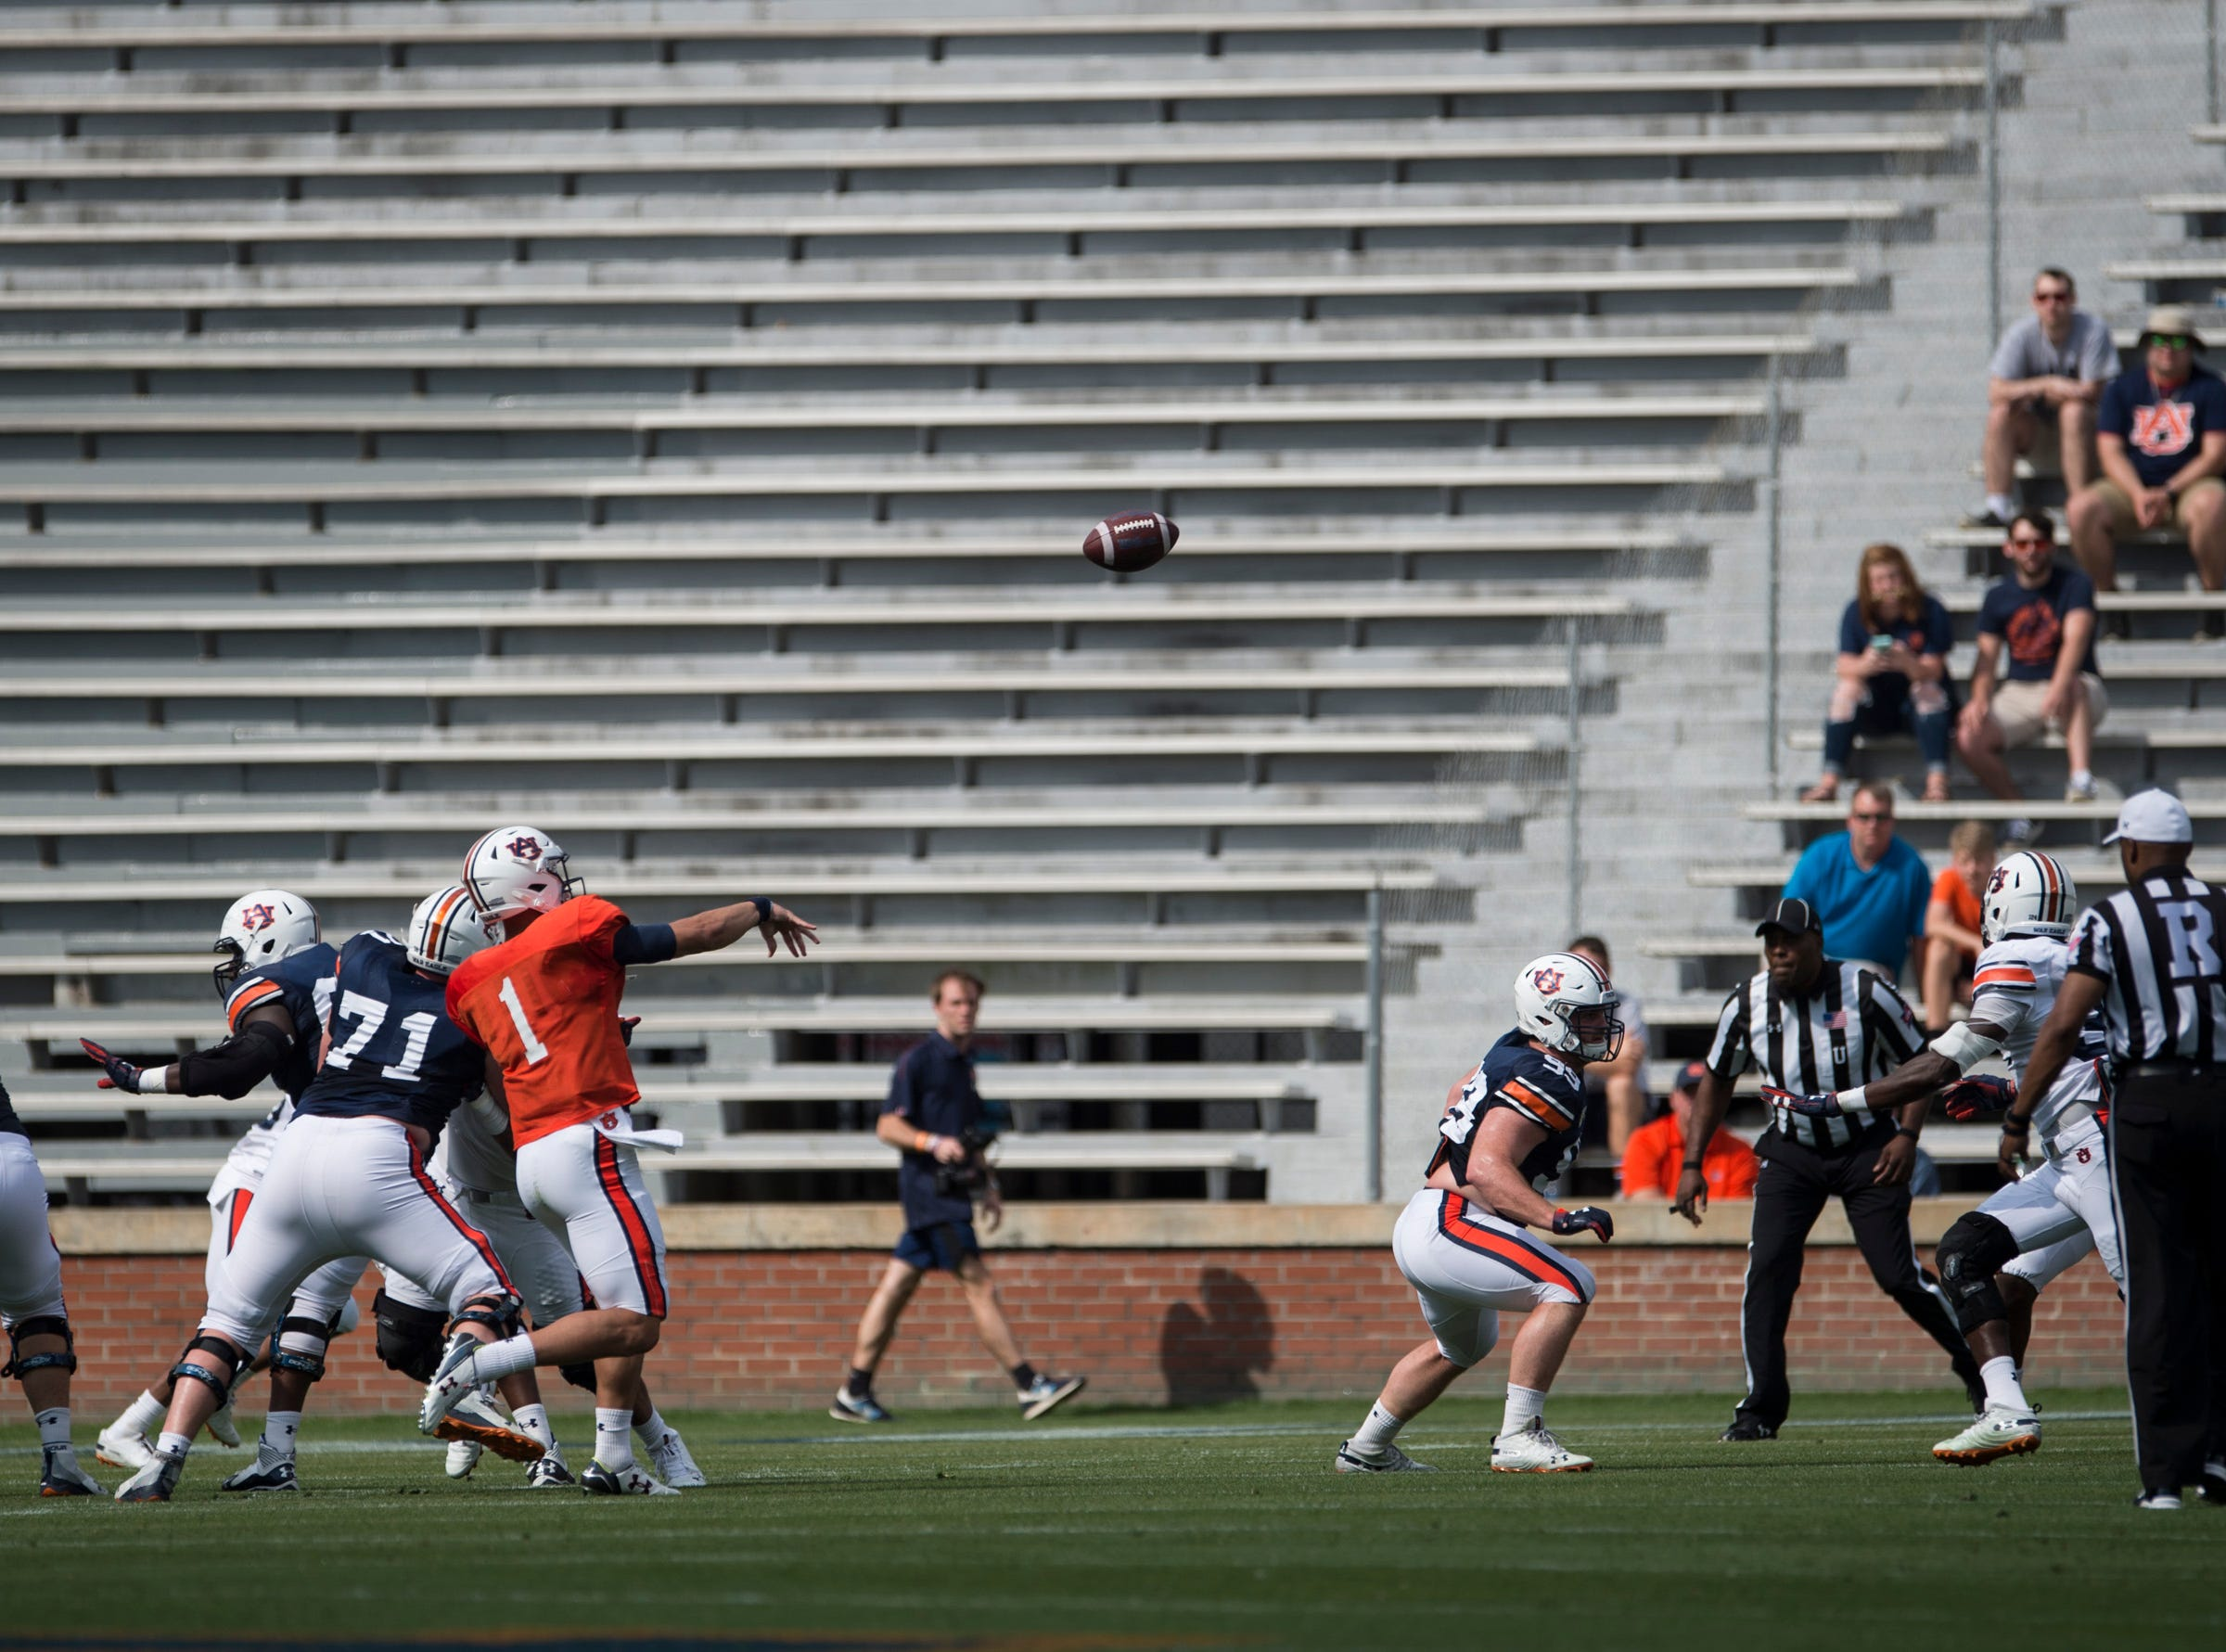 Auburn quarterback Joey Gatewood (1) throws a pass during the A-Day spring practice gameat Jordan-Hare Stadium in Auburn, Ala., on Saturday, April 13, 2019.